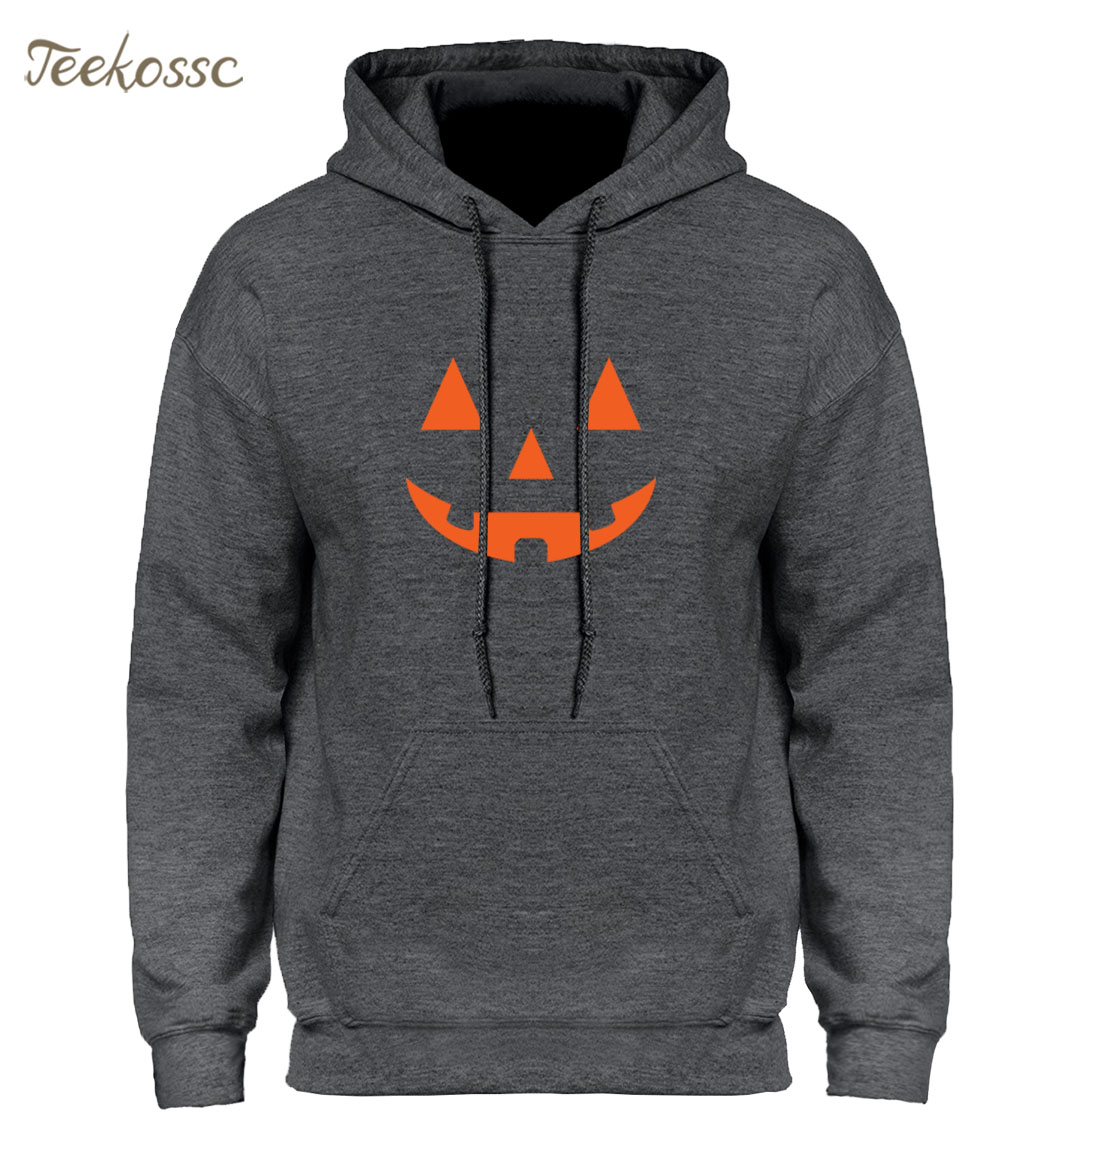 Jack O Lantern Pumpkin Halloween Clothing Hoodies Sweatshirts Men 2018 New Winter Autumn Hooded Hoody Holiday Costumes Hoodie Men's Clothing